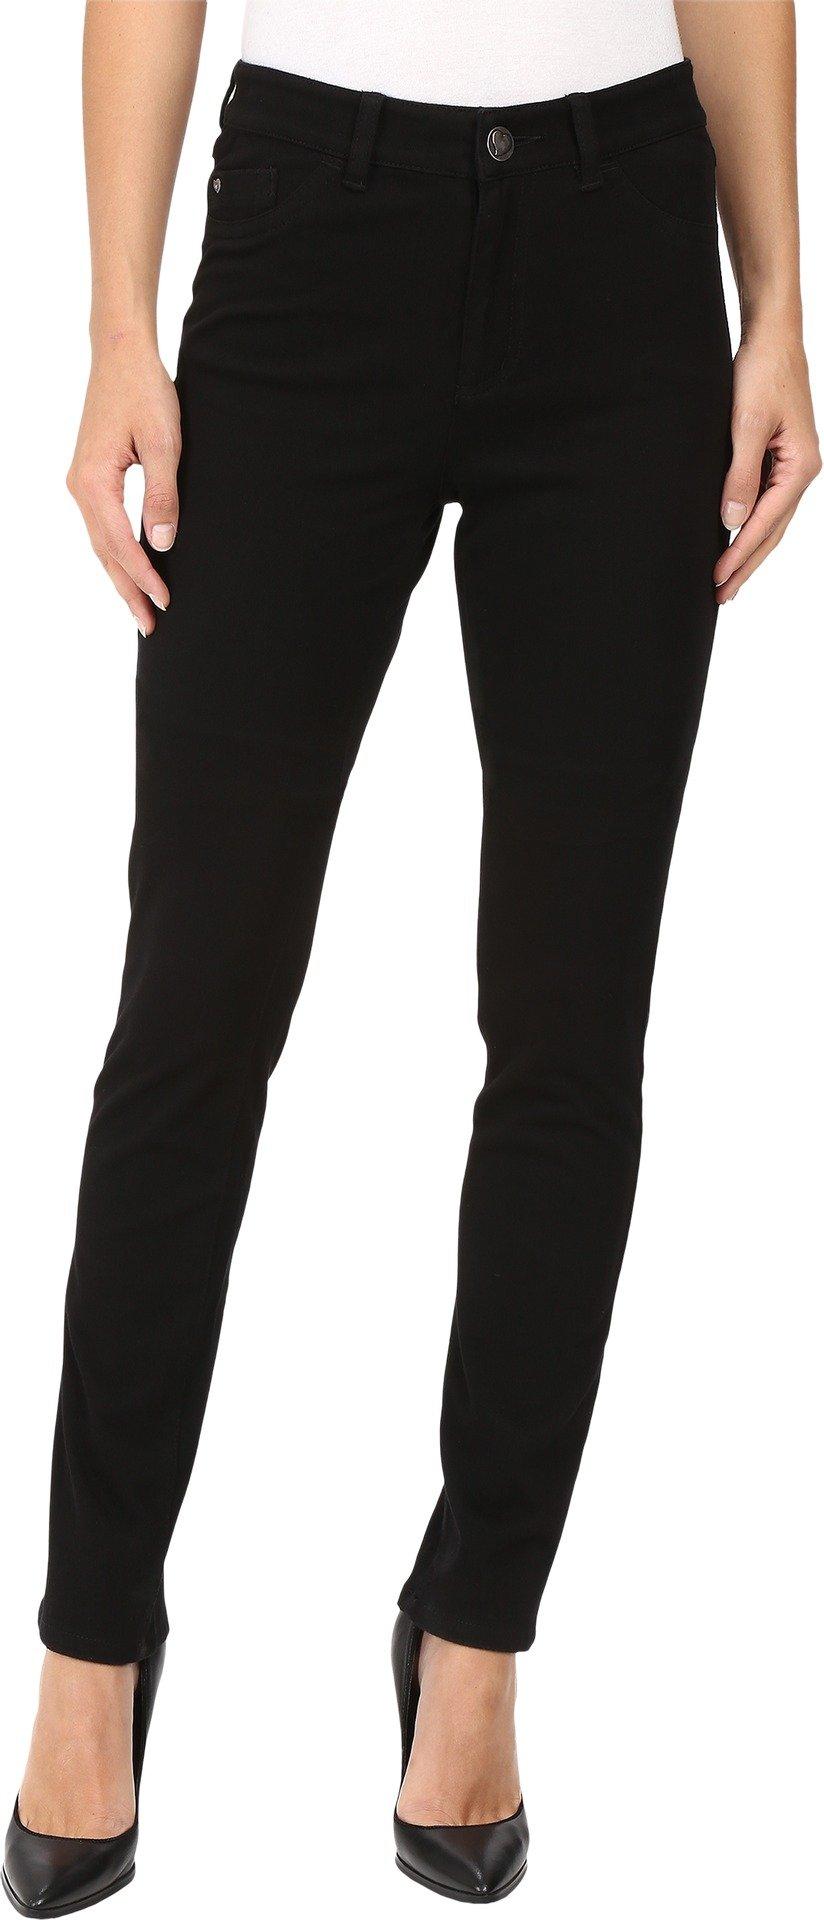 FDJ French Dressing Jeans Women's Olivia Slim Leg/Love Denim In Black Black 8 33